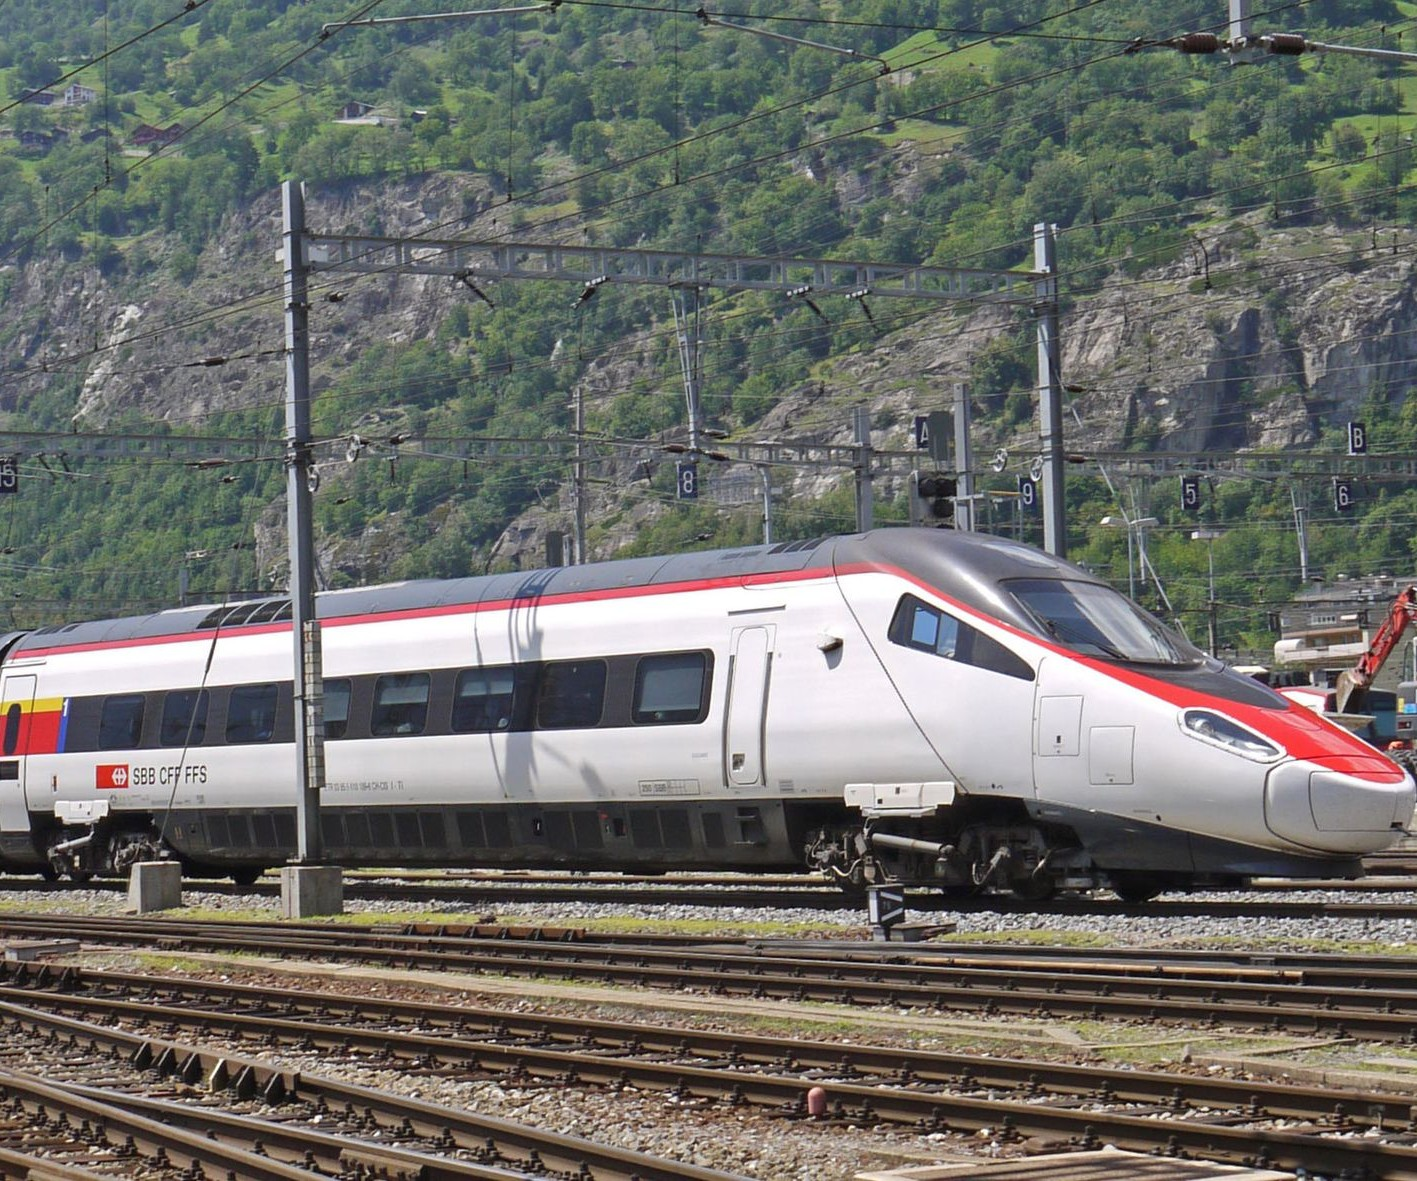 German high-speed train